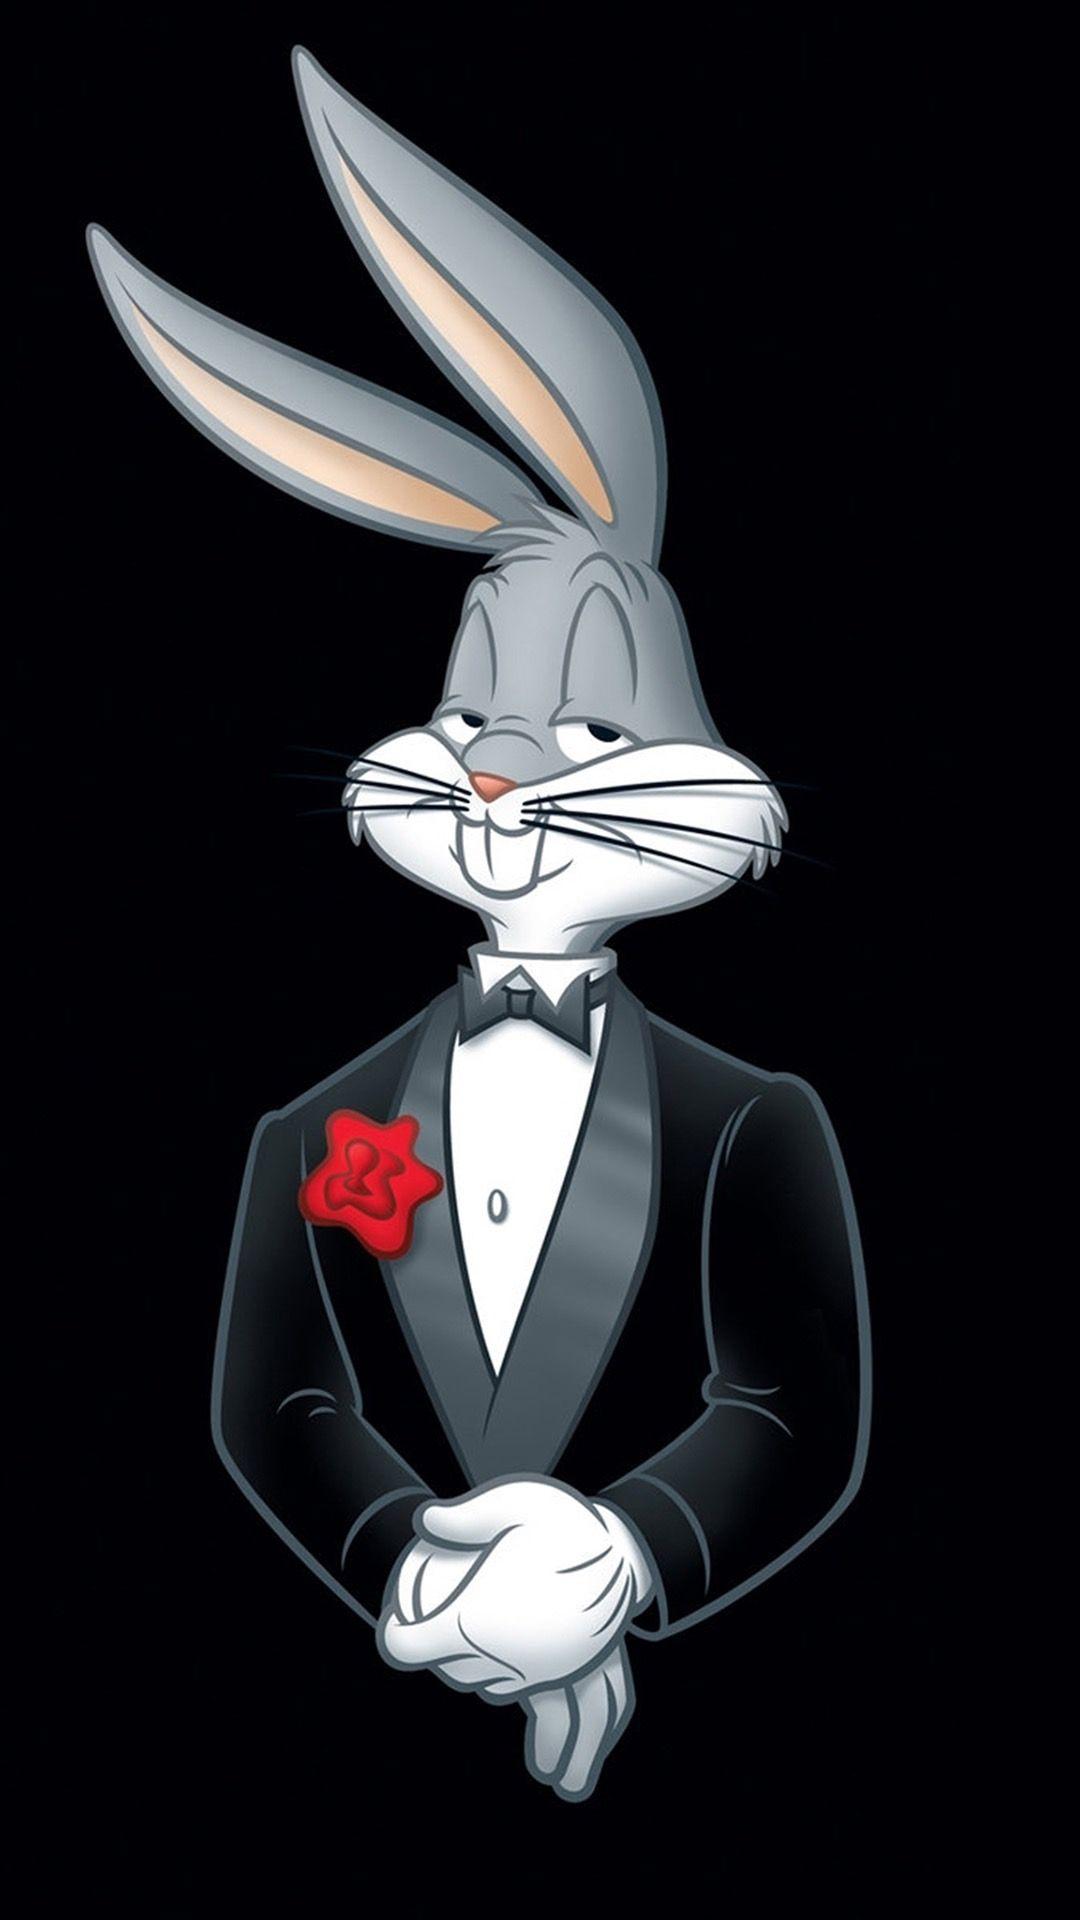 Pin De Fio En Wallpapers Imagenes De Bugs Bunny Looney